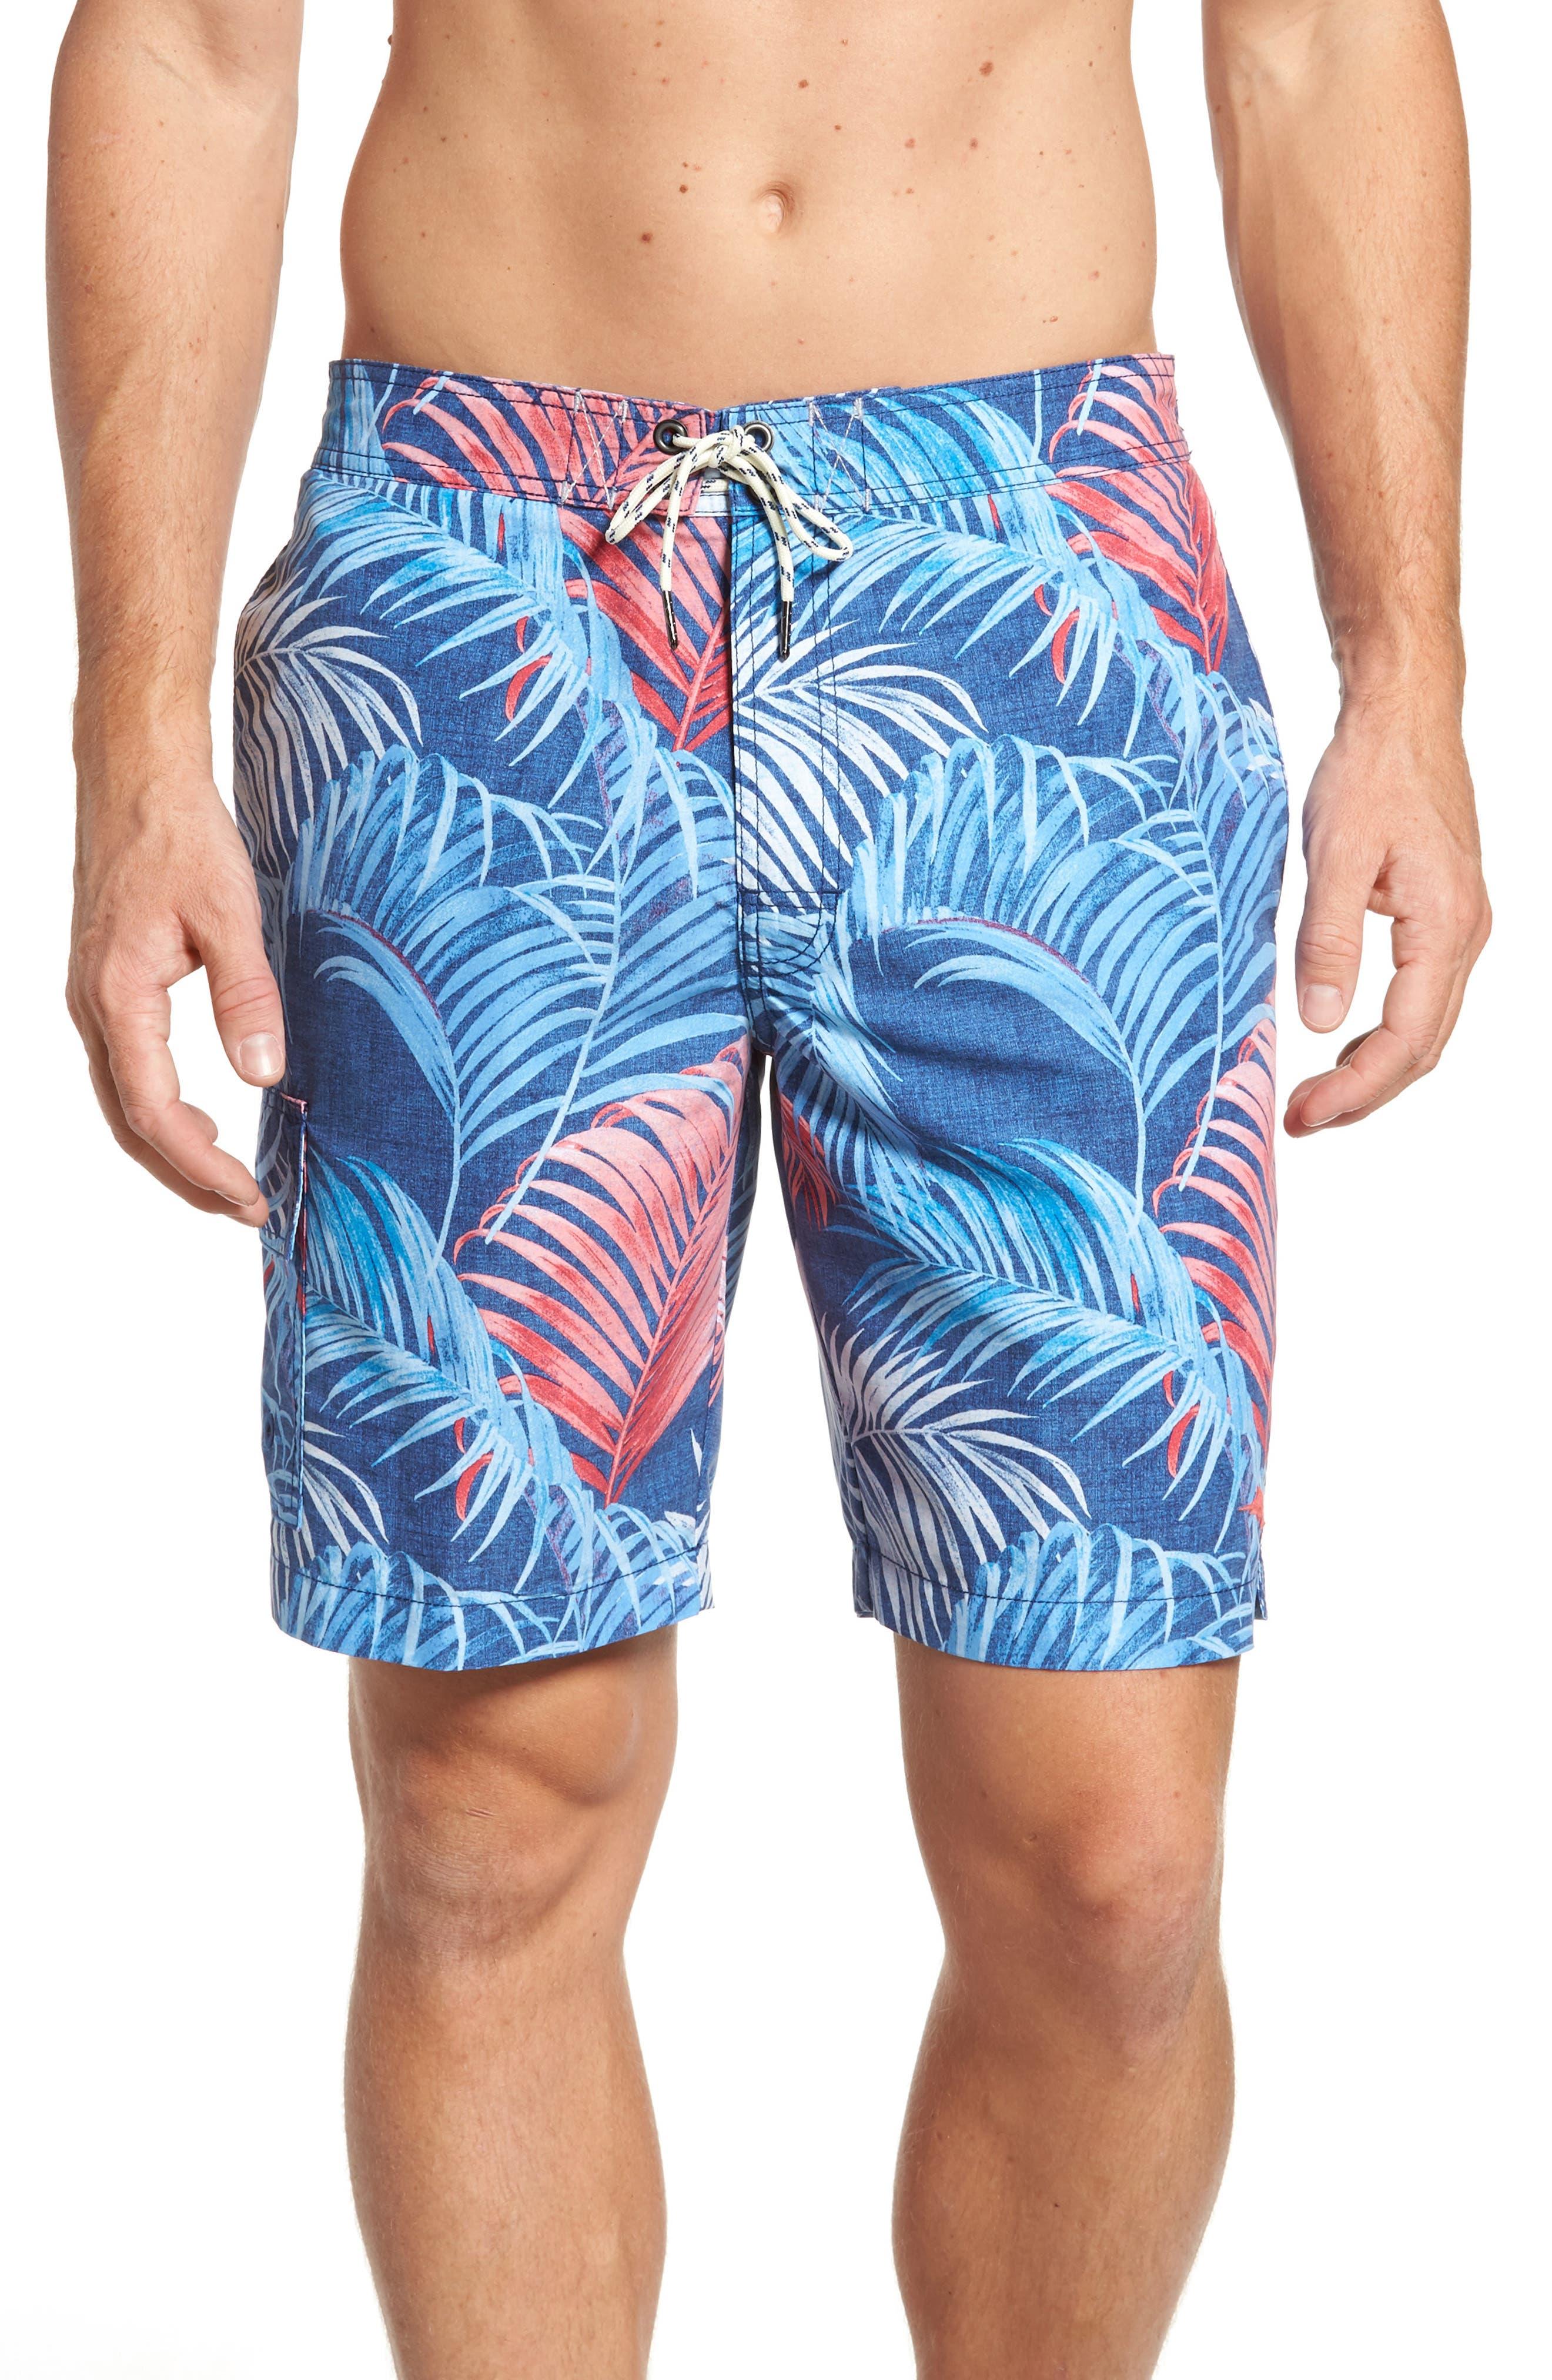 Alternate Image 1 Selected - Tommy Bahama Baja Fez Frond Board Shorts